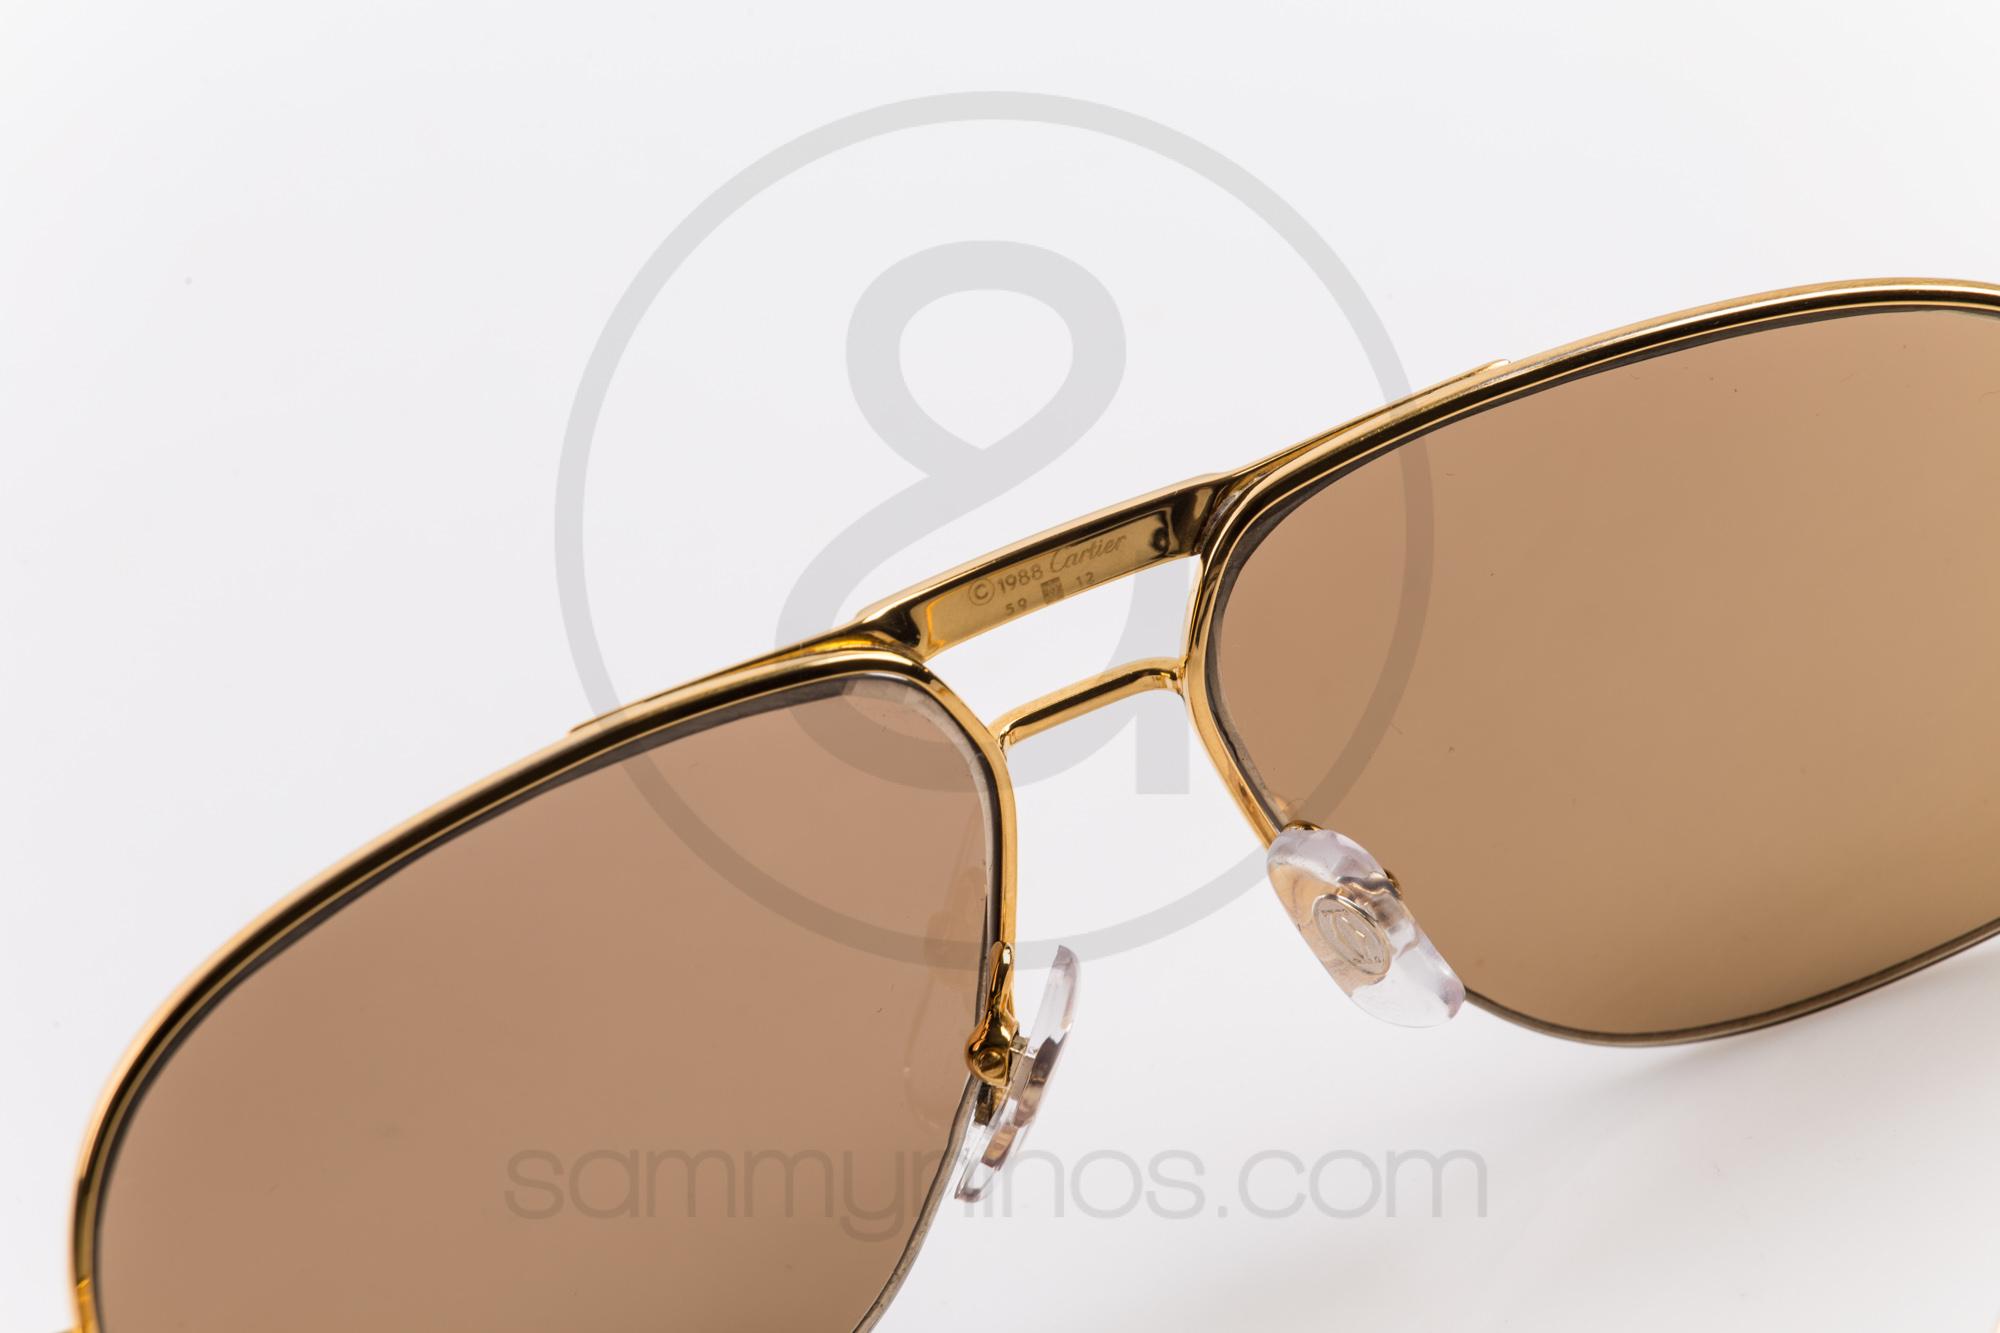 Cartier Gold Frame Sunglasses : Cartier Orsay 59-12 Sammy & Ninos Store